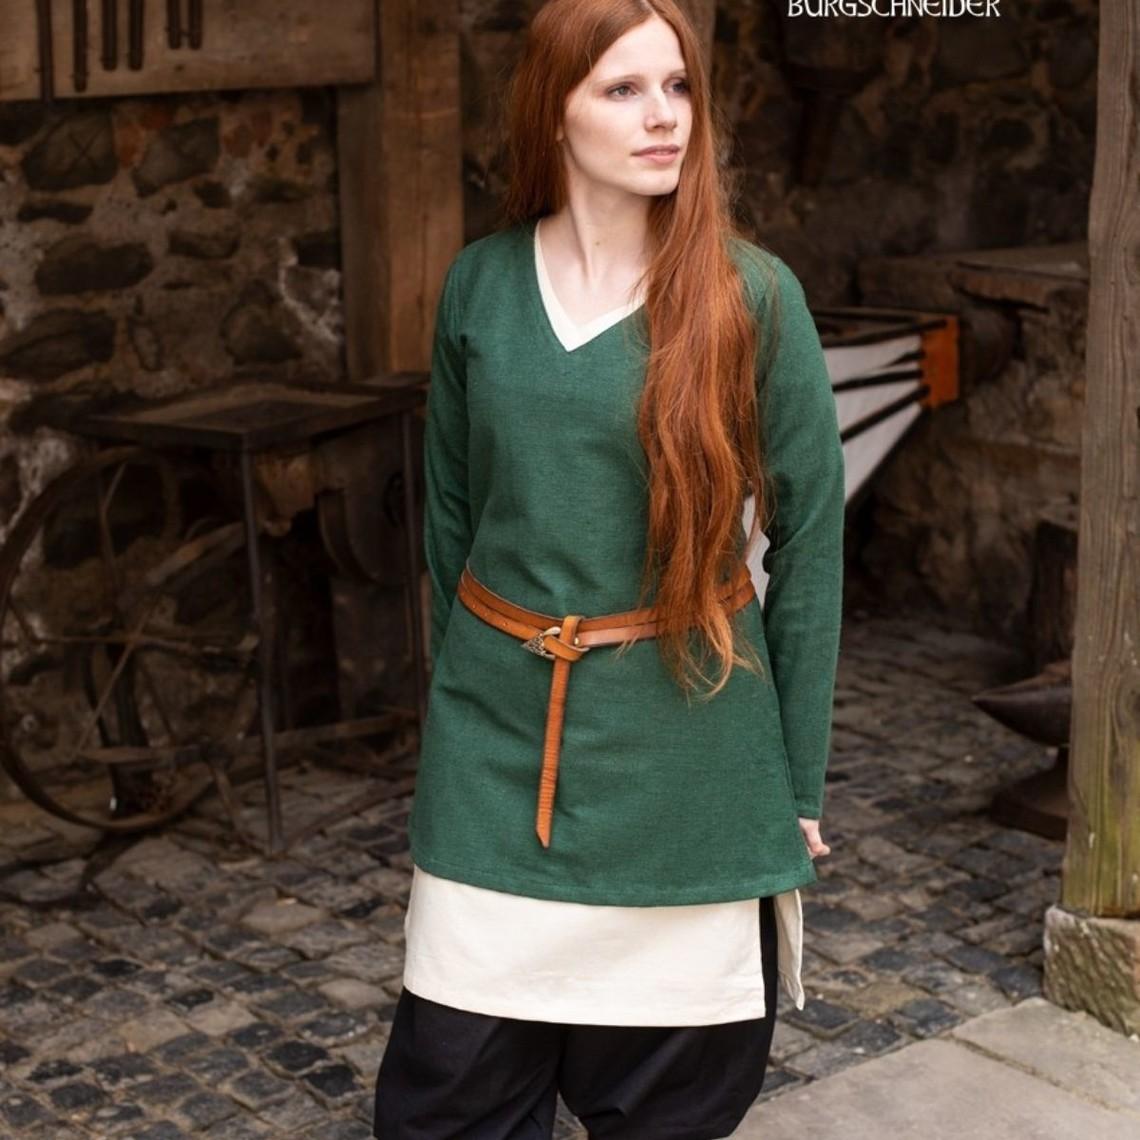 Burgschneider Tunique bouclier-jeune fille Frekja, vert